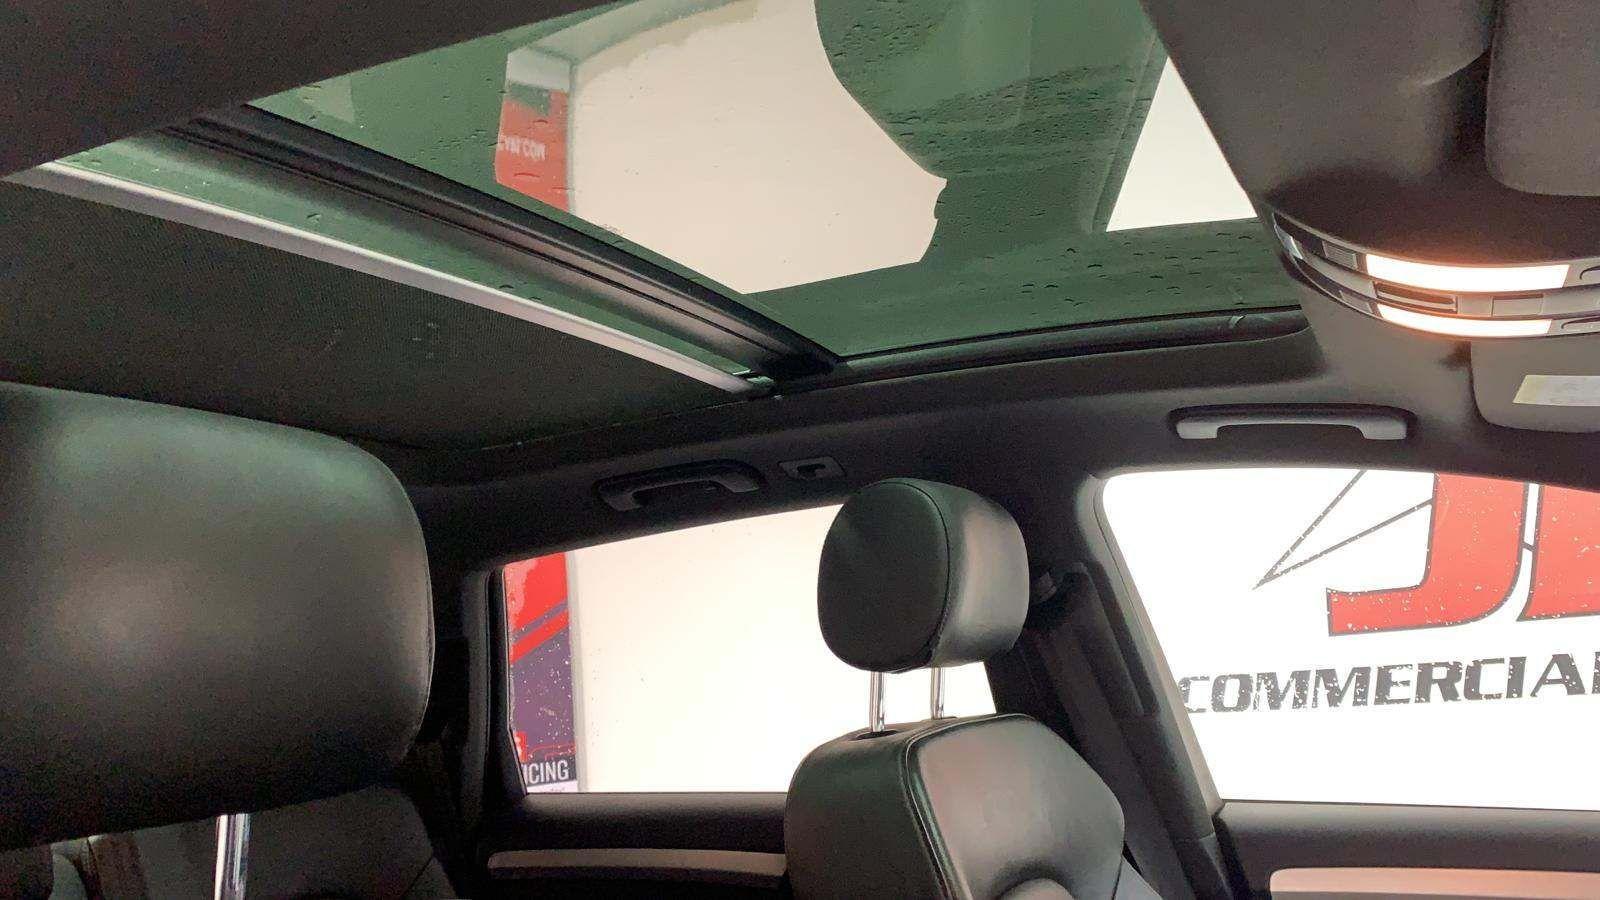 2015 AUDI Q7 3.0 TDI S line Plus Tiptronic quattro Diesel Automatic **Full Leather** – J R S Commercials And Cars Dungannon full